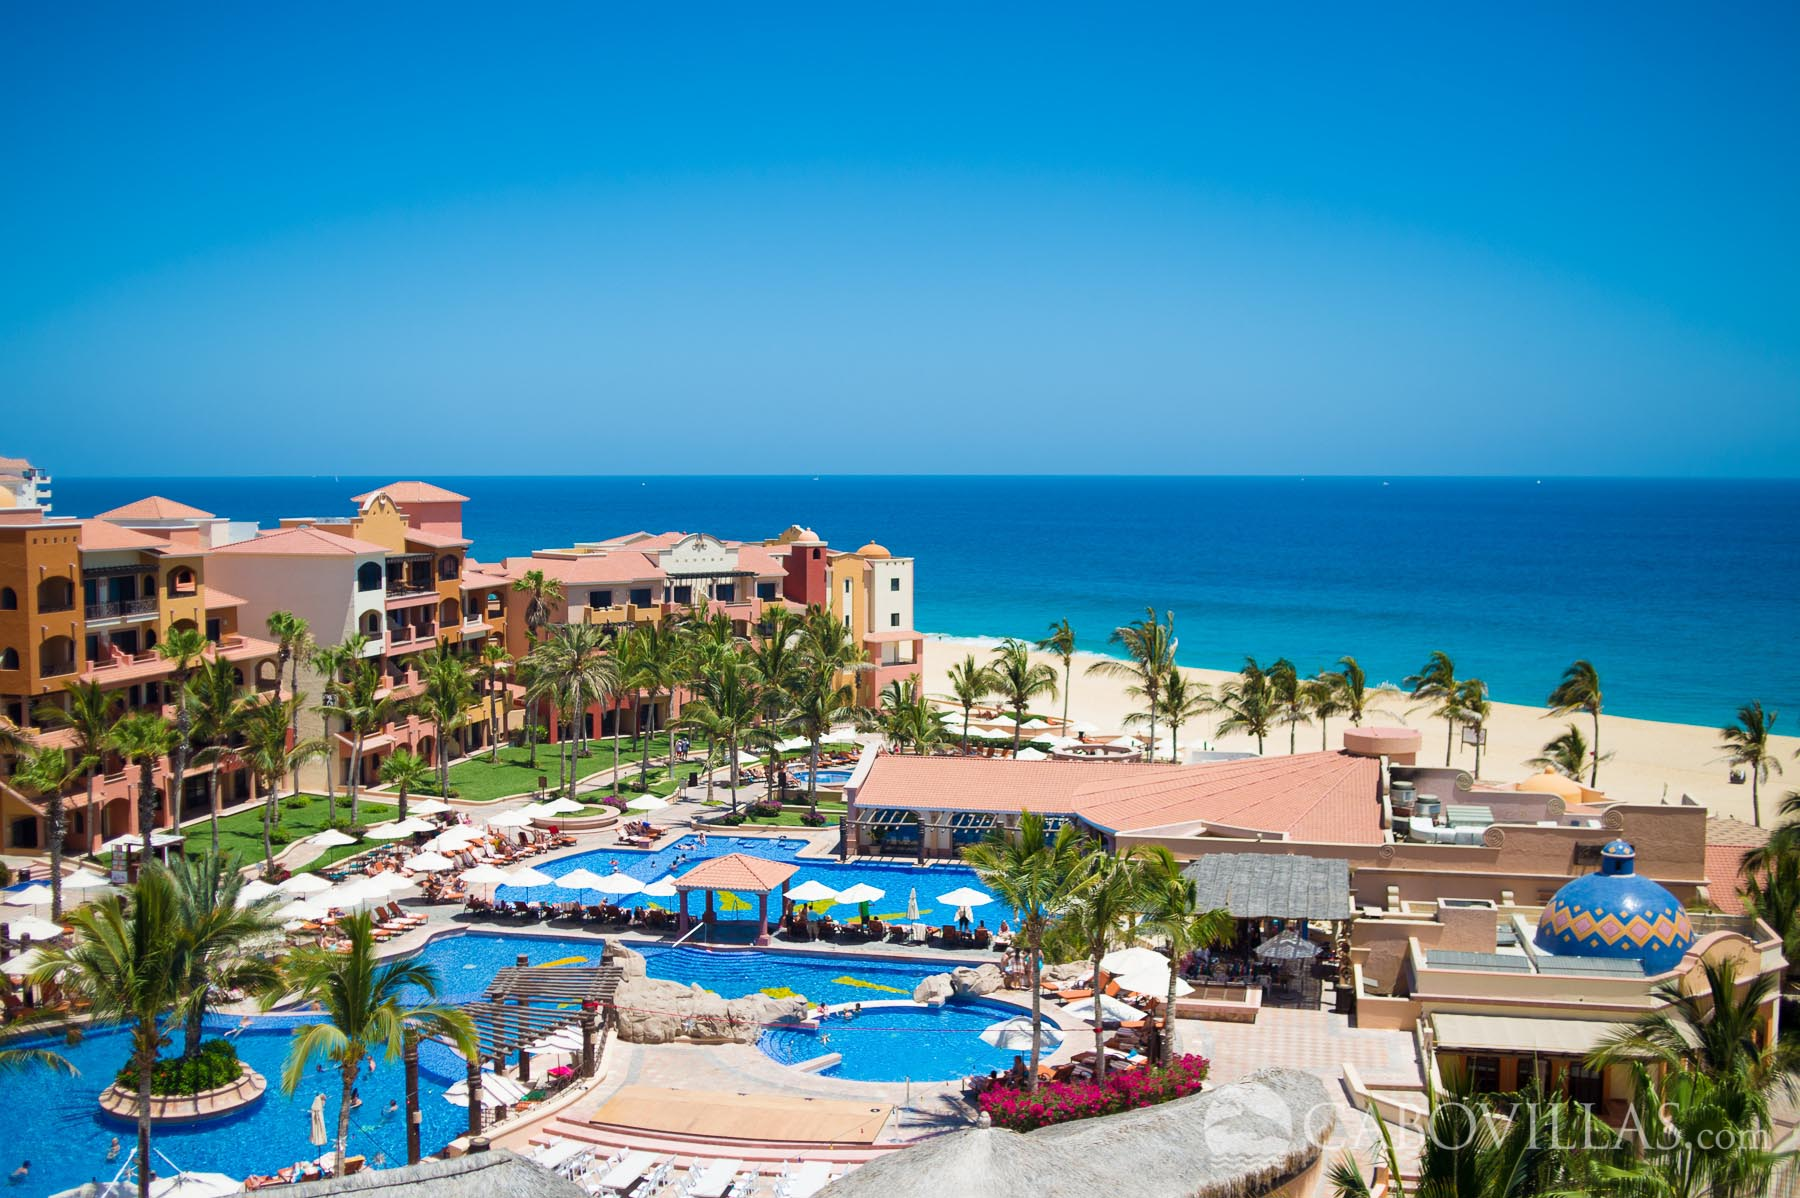 Playa Grande Beach Resort Photo 1